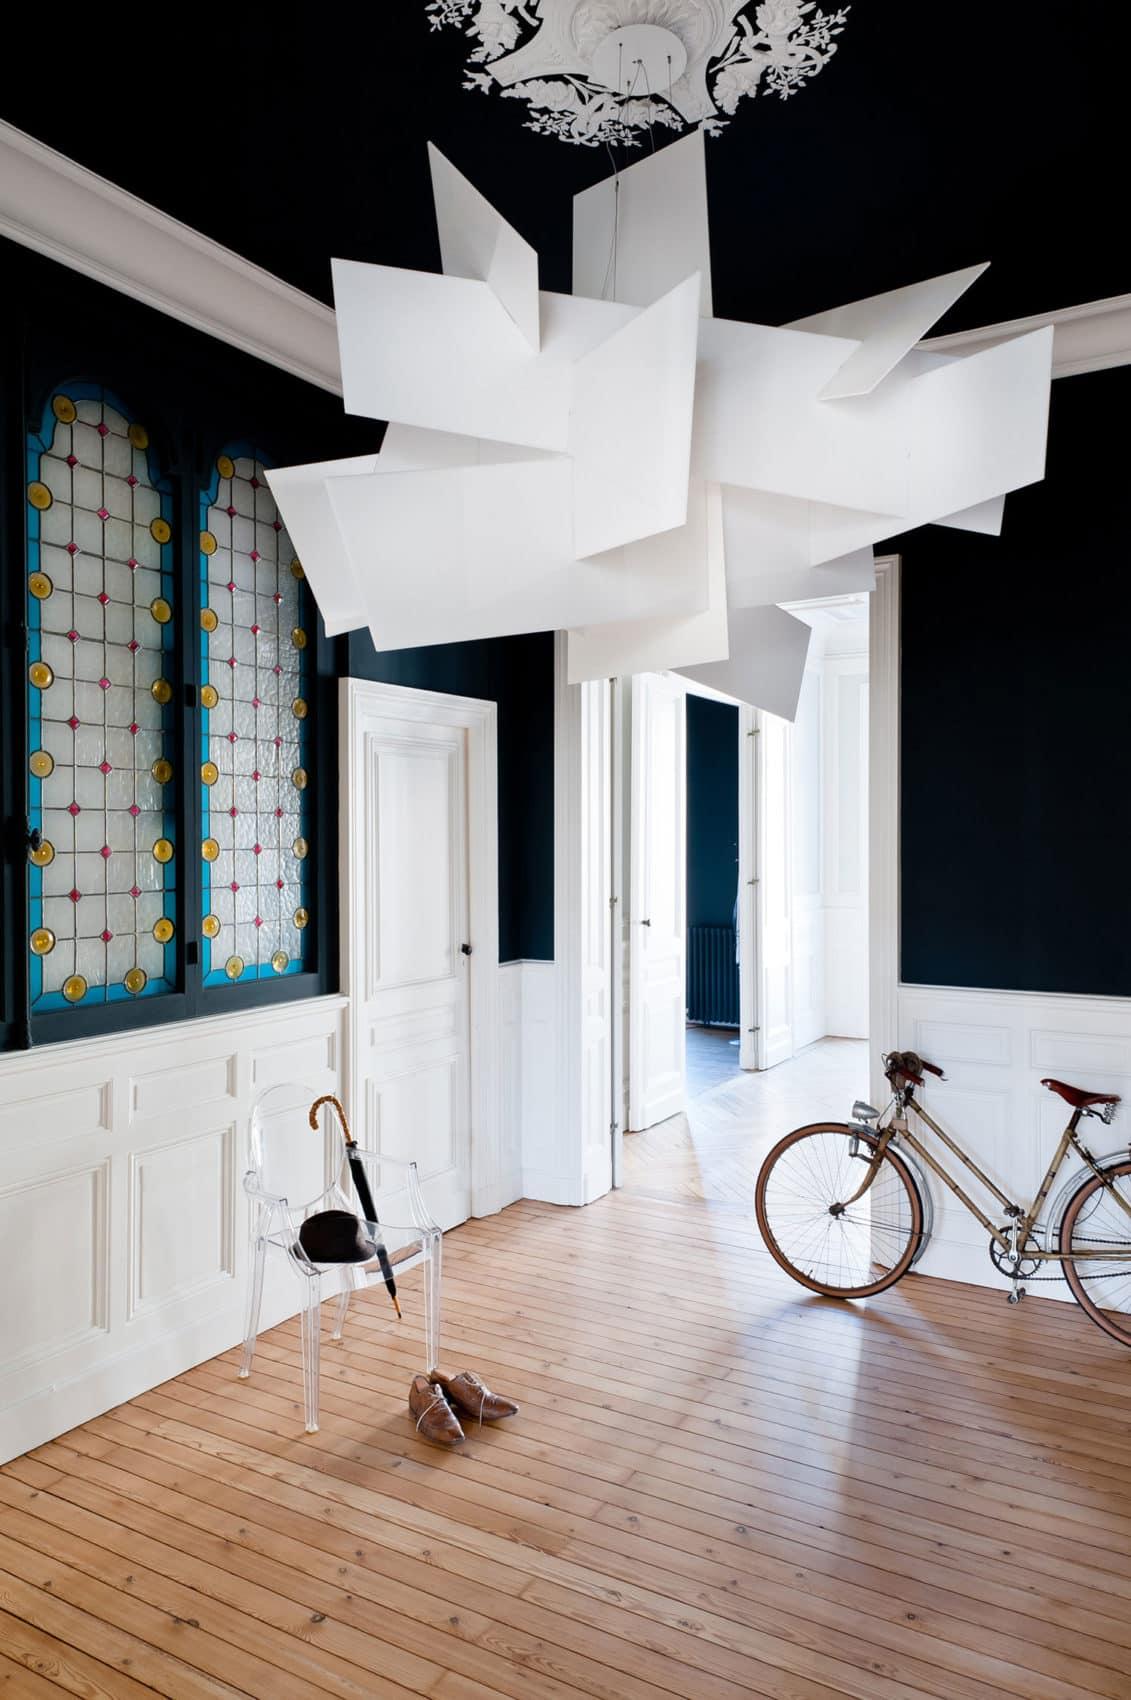 Apartment Building by Daphné Serrado (1)